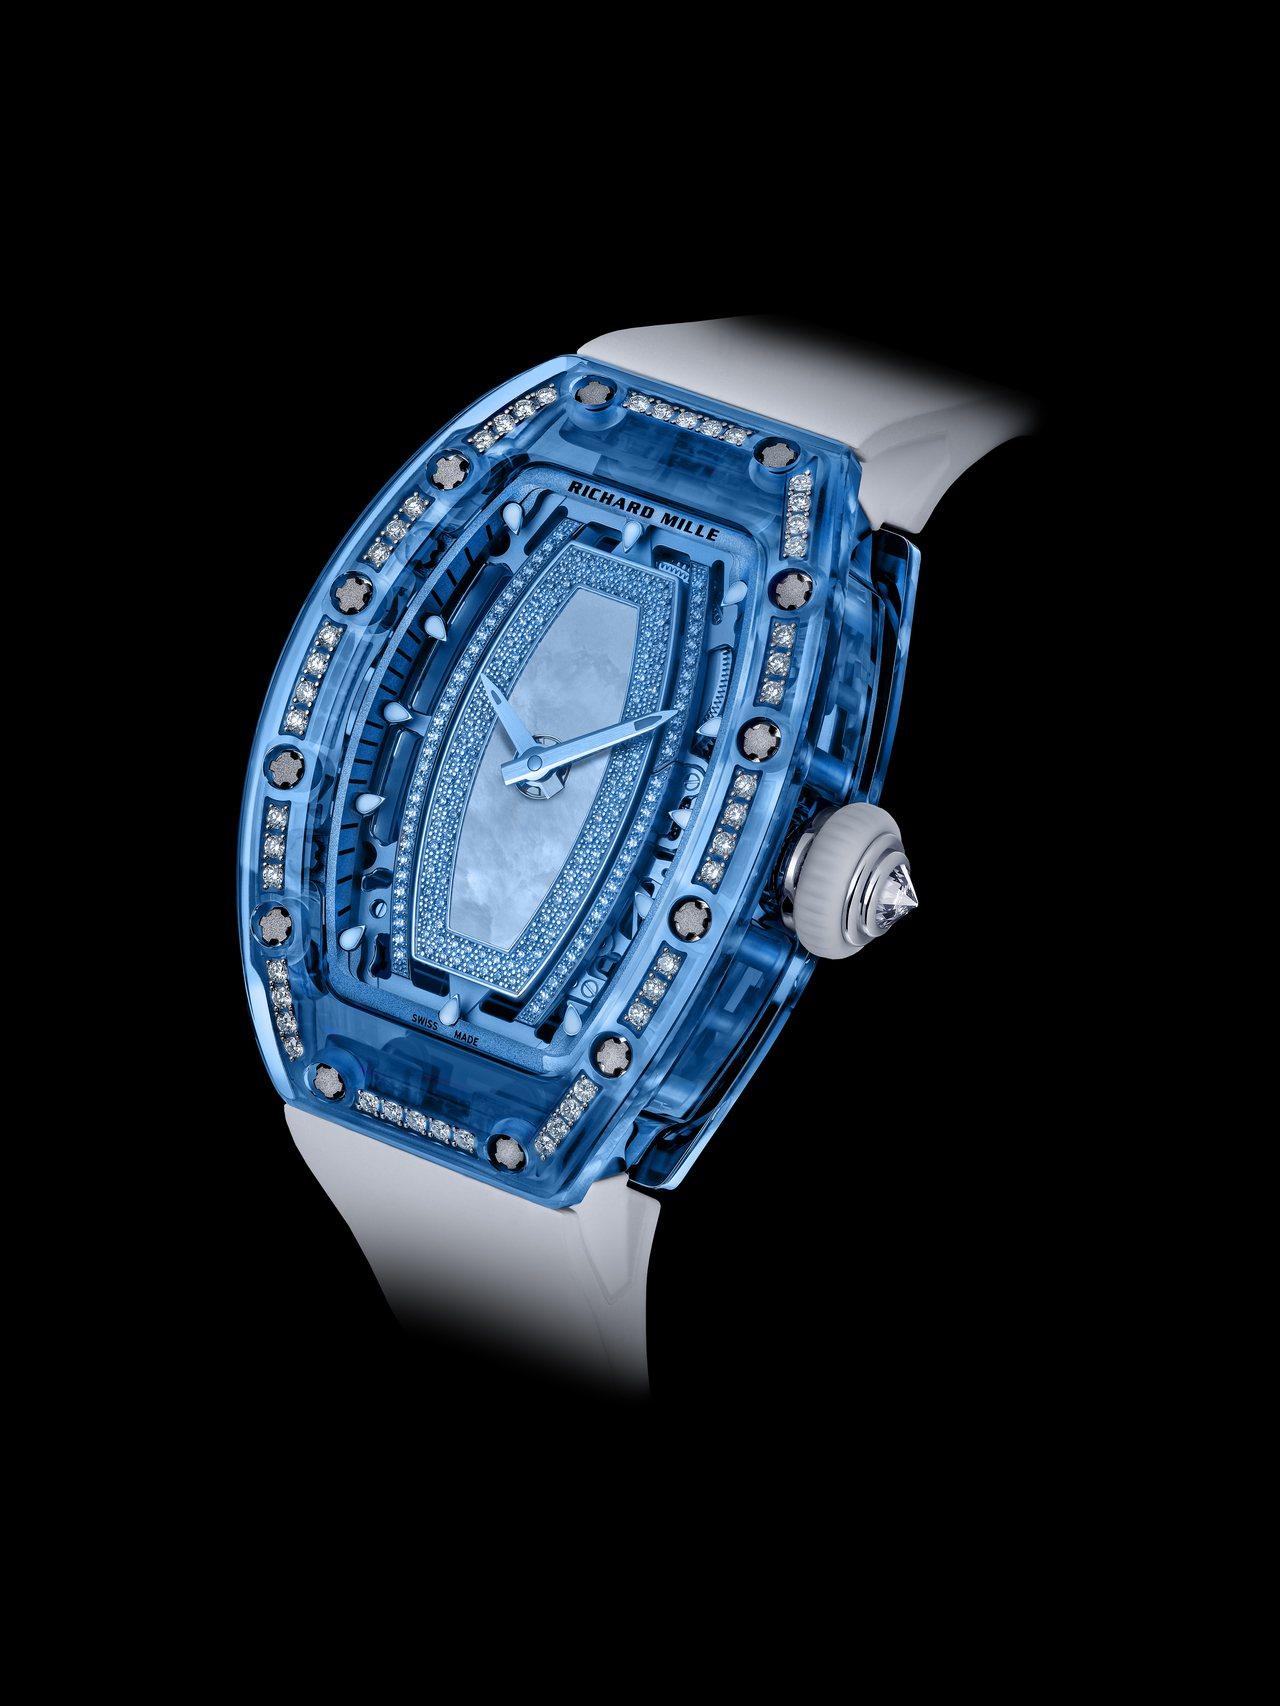 RM 07-02鑲鑽藍寶石水晶女表,藍色藍寶石水晶玻璃表殼,搭配珍珠母貝表盤,價...